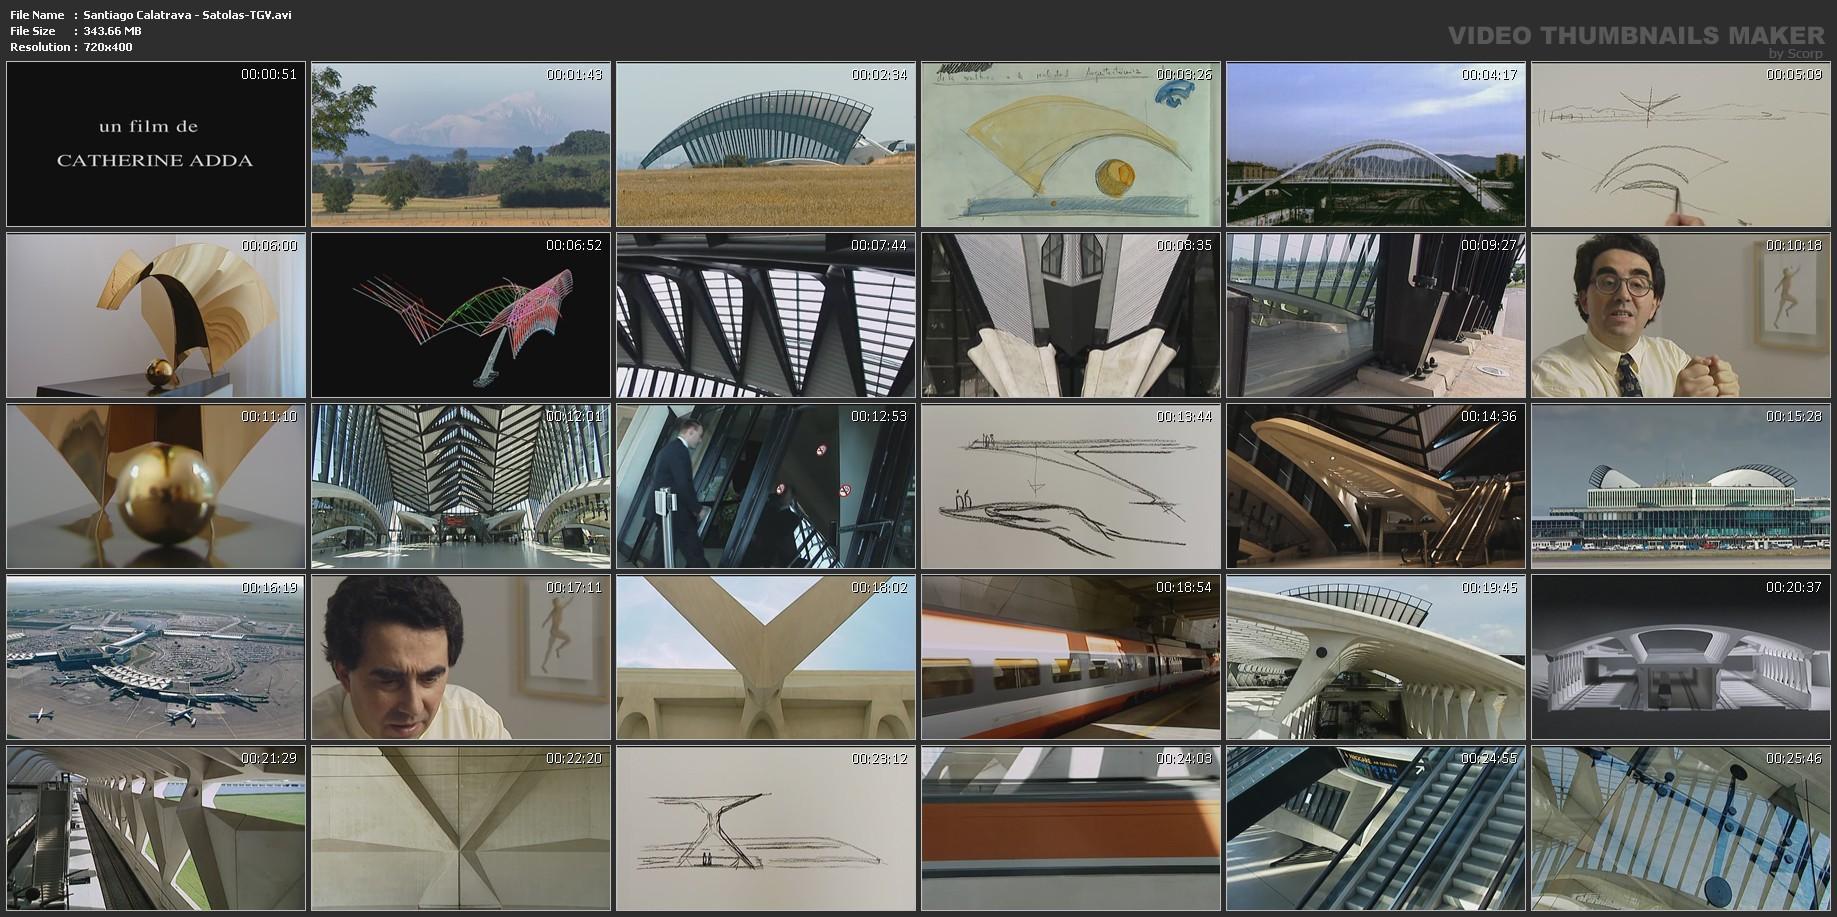 http://d20.ir/14/Images/367/Large/Santiago_Calatrava_-_Satolas-TGV.avi.jpg